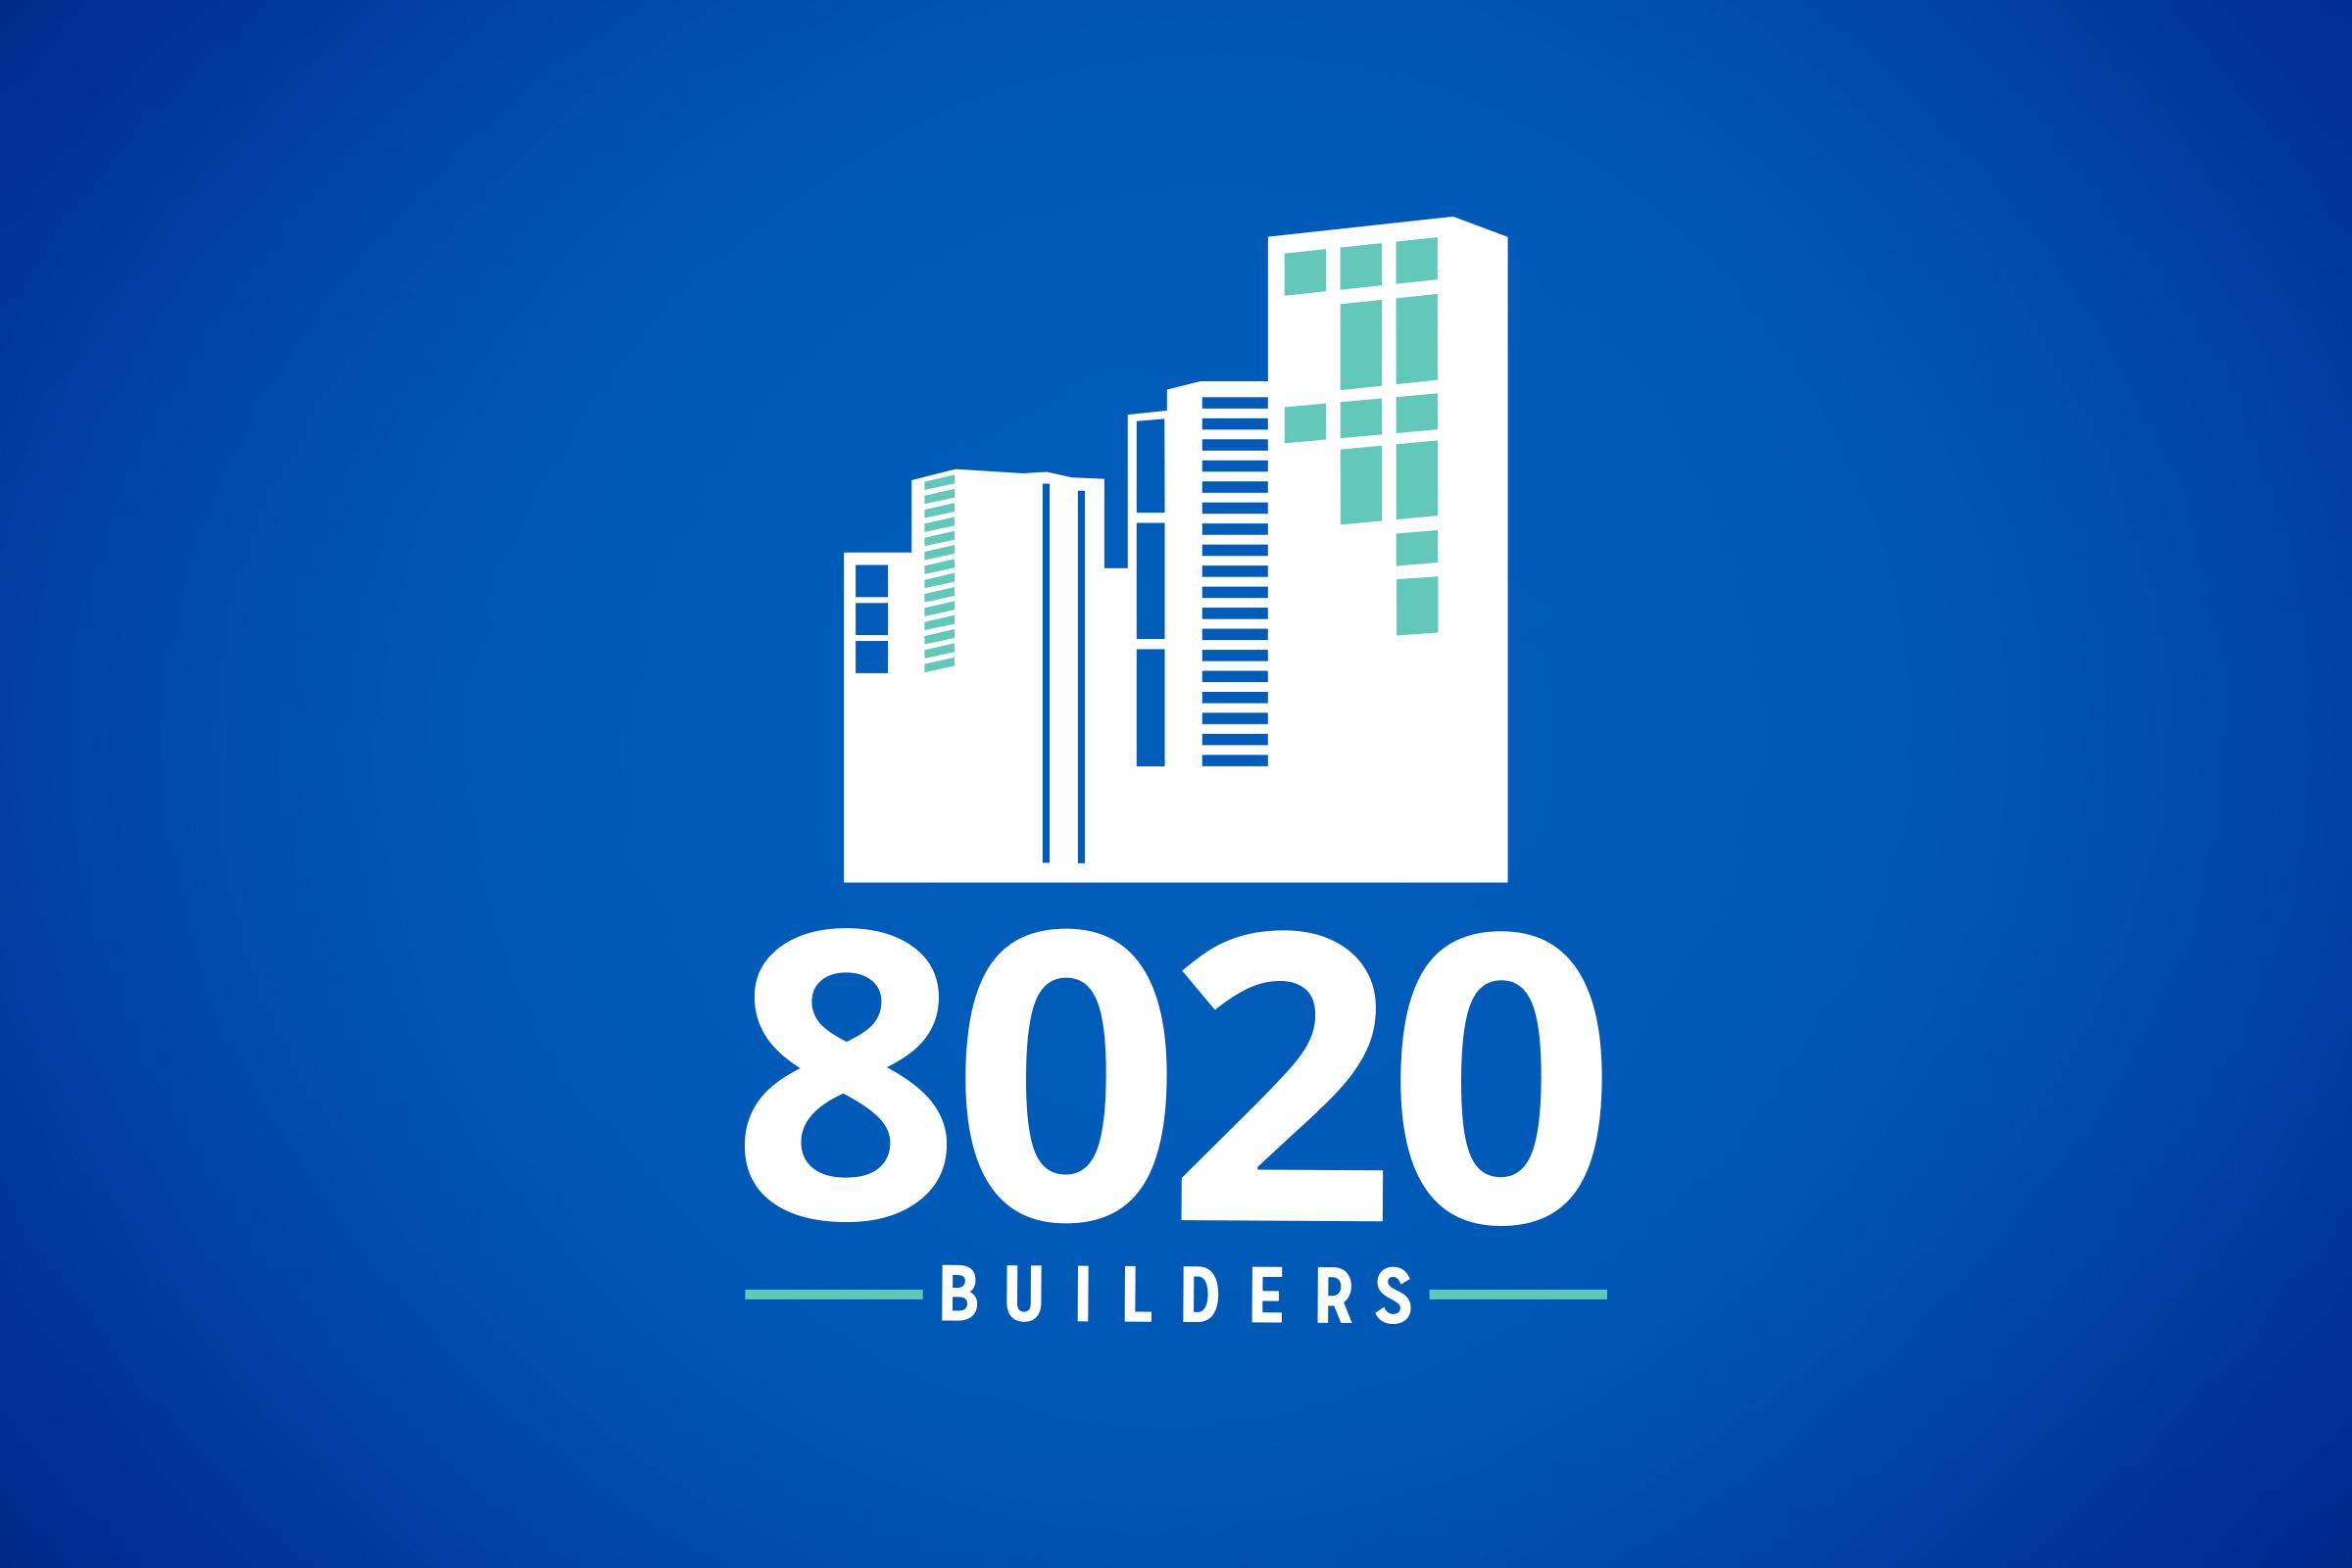 hearthfire-creative-logo-brand-identity-designer-denver-colorado-8020-builders-2.jpg